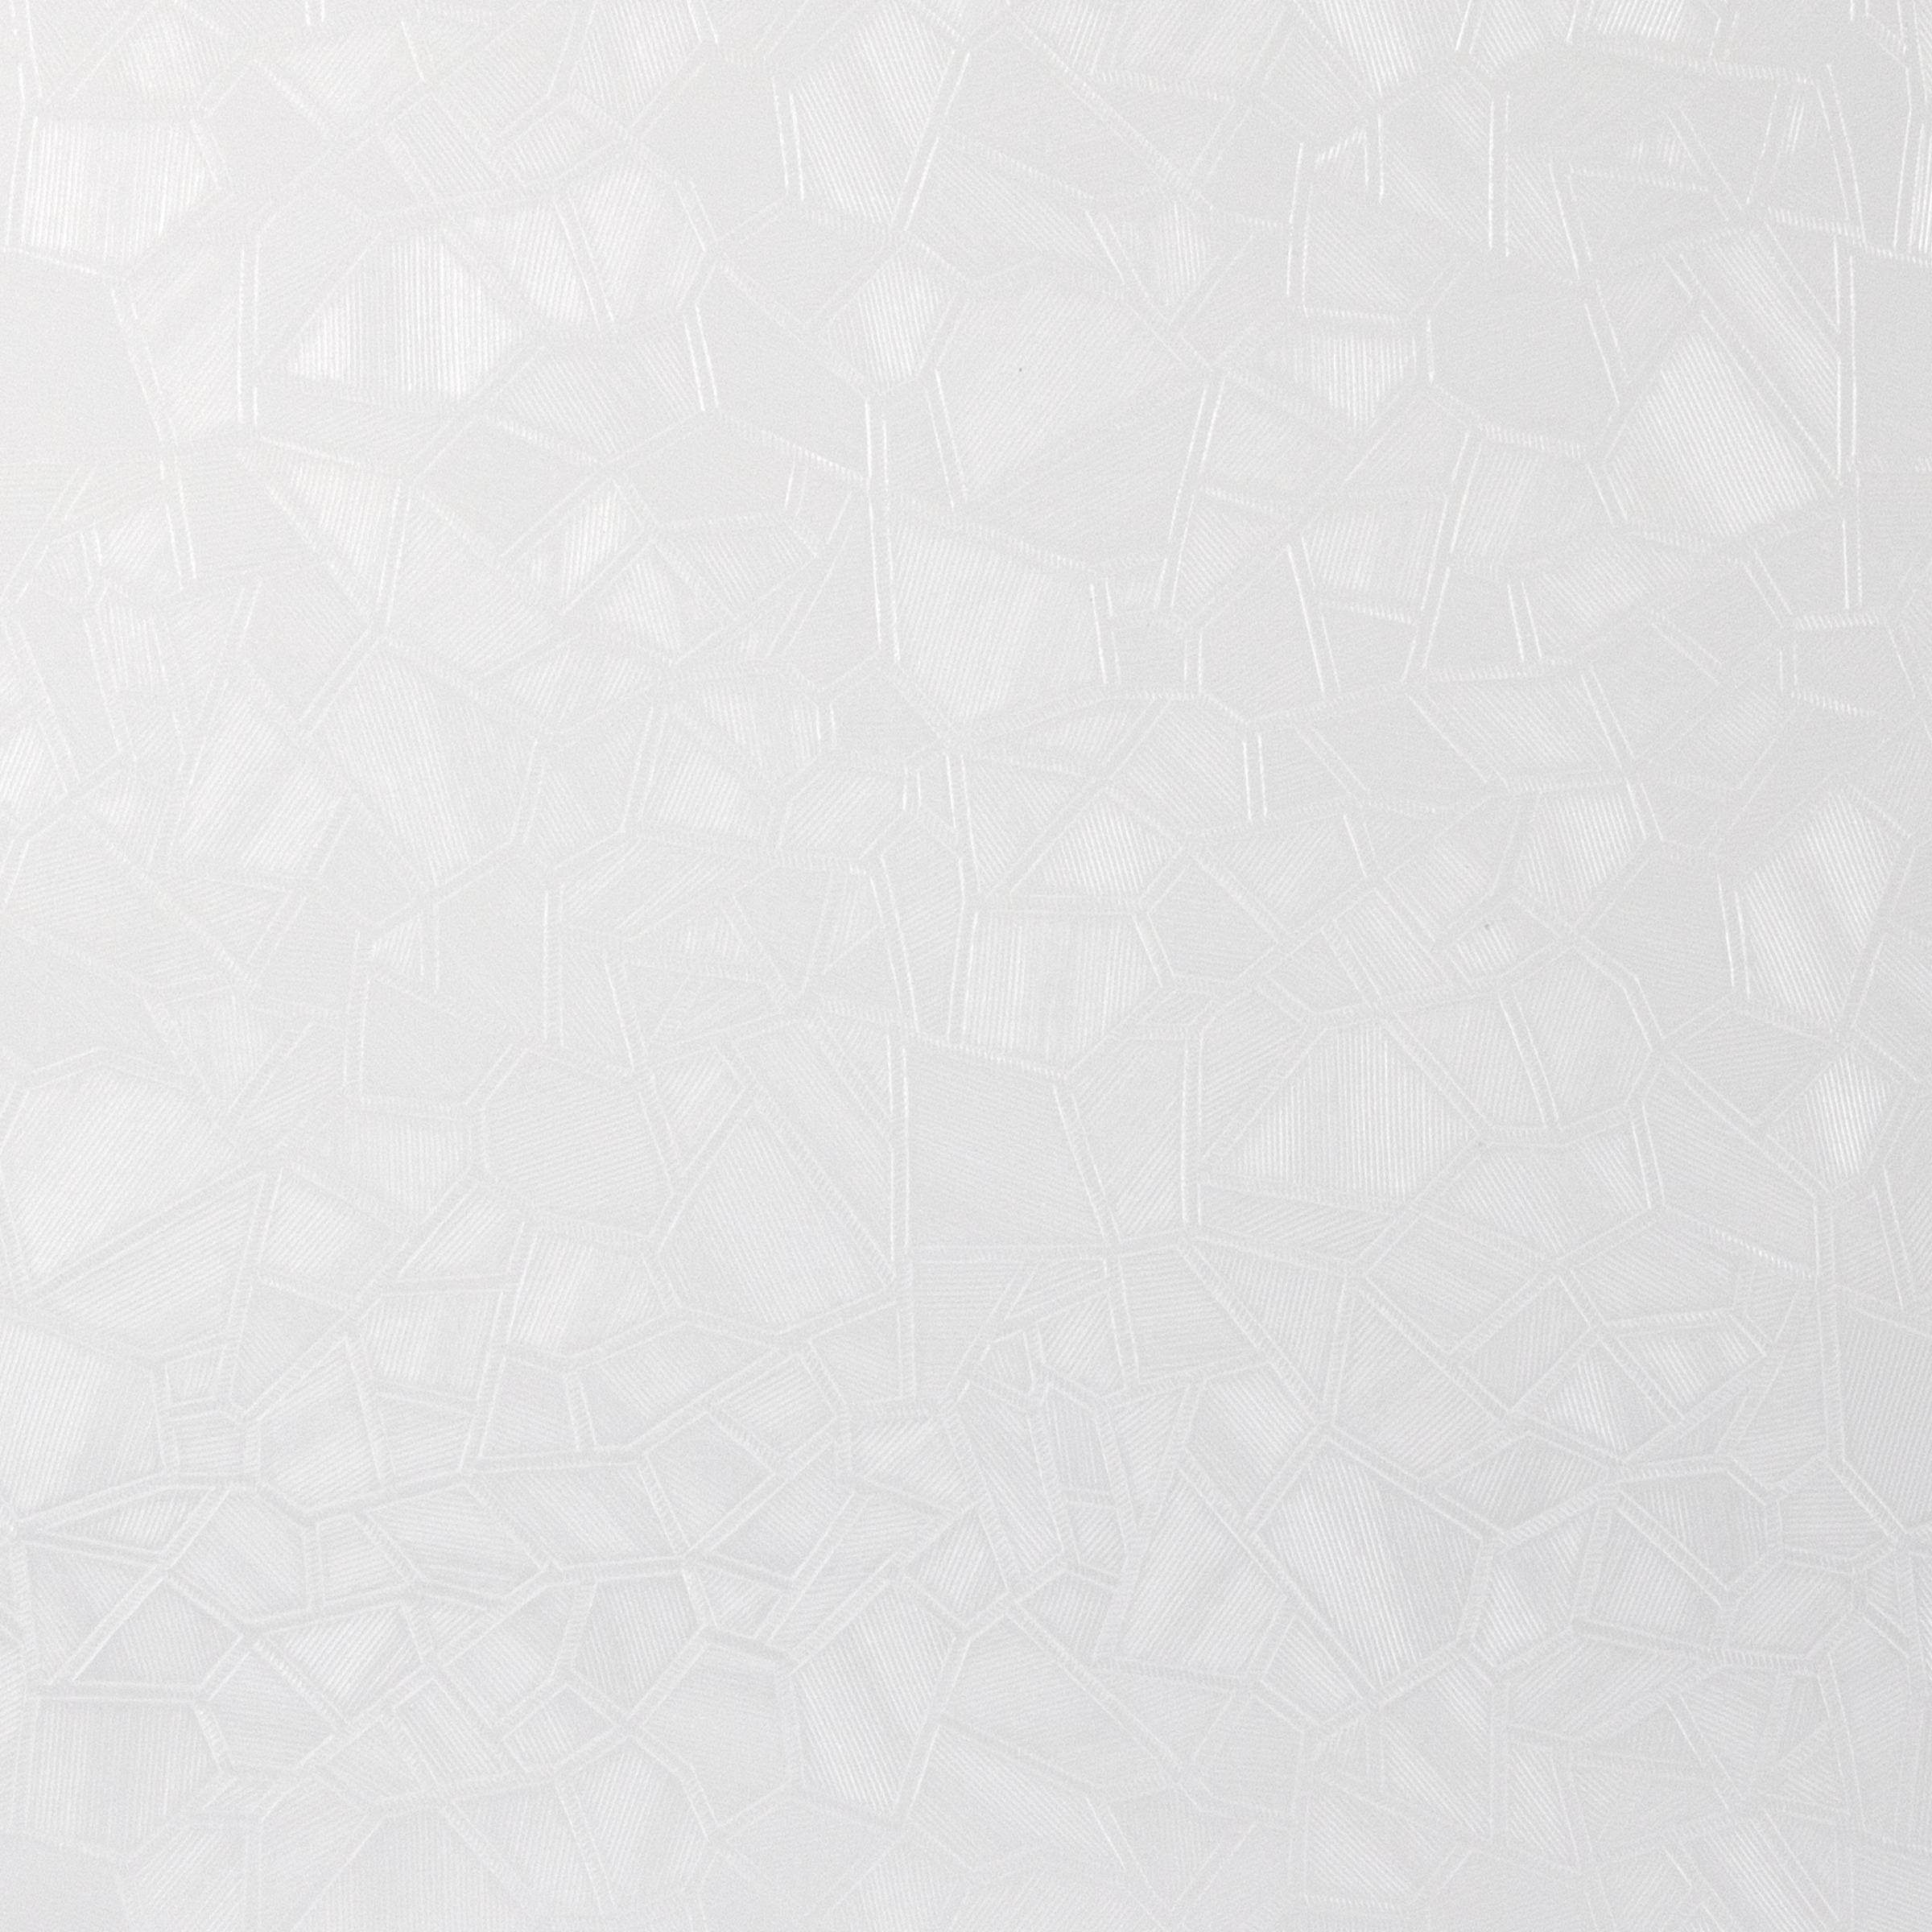 Raamfolie scherven semi transparant 45 cm x 2 meter zelfklevend